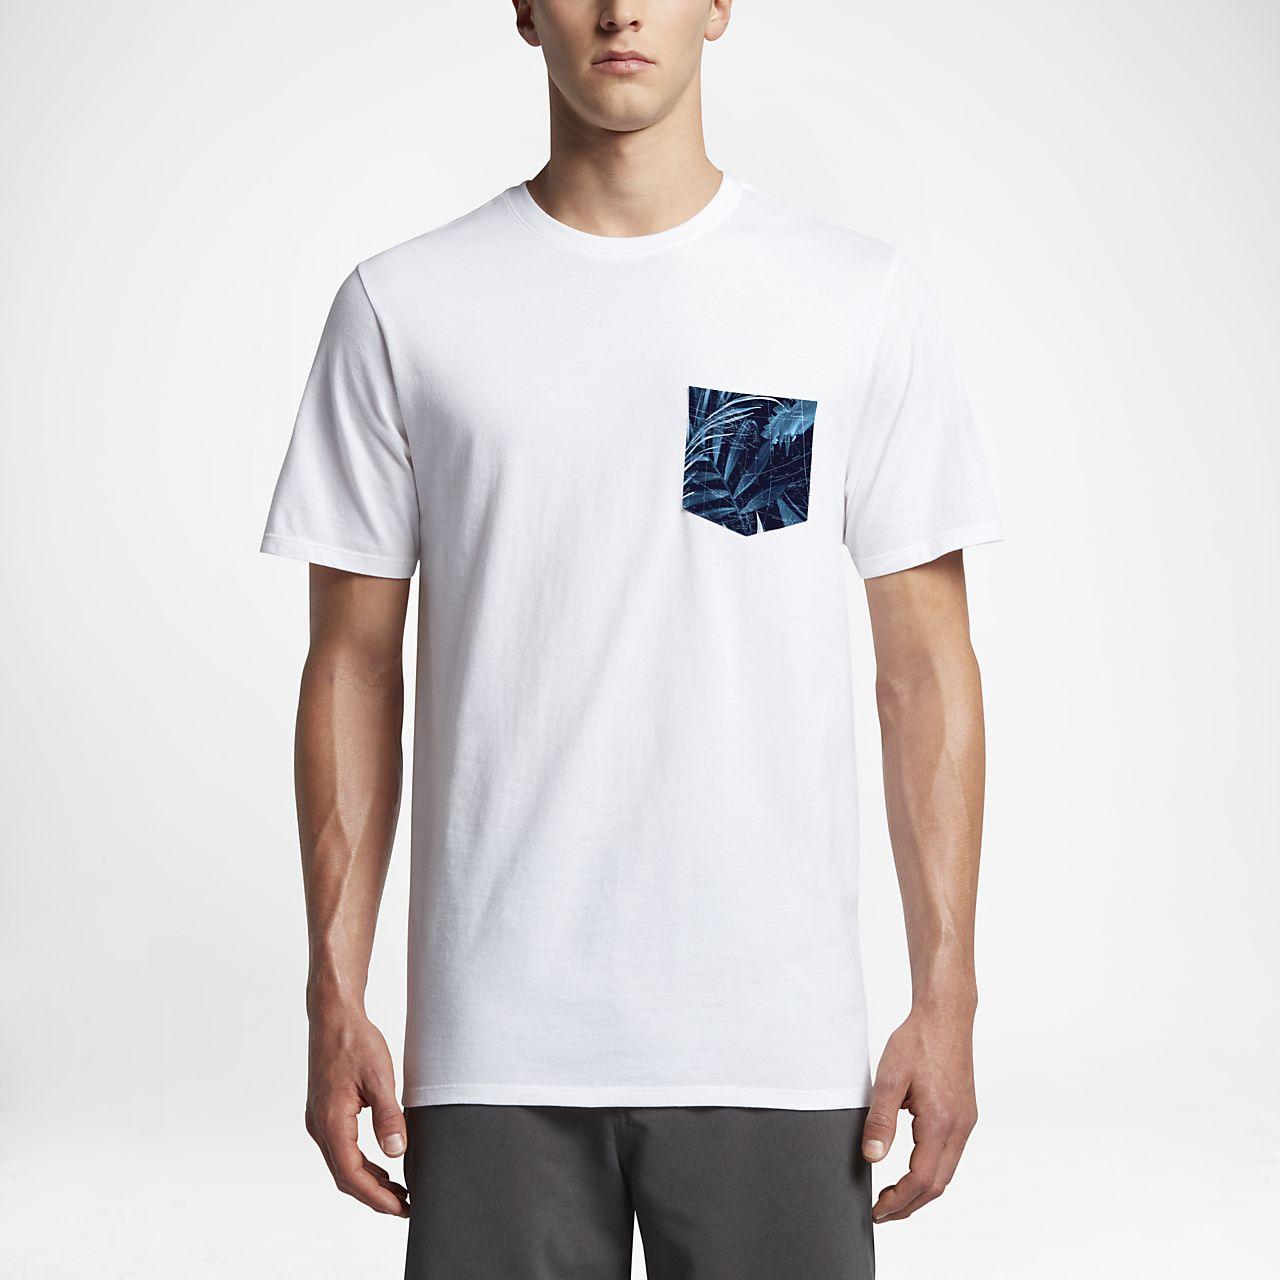 Homme Fr Plot Jjf Tee Pour Hurley Shirt Maps w0qUnUYR